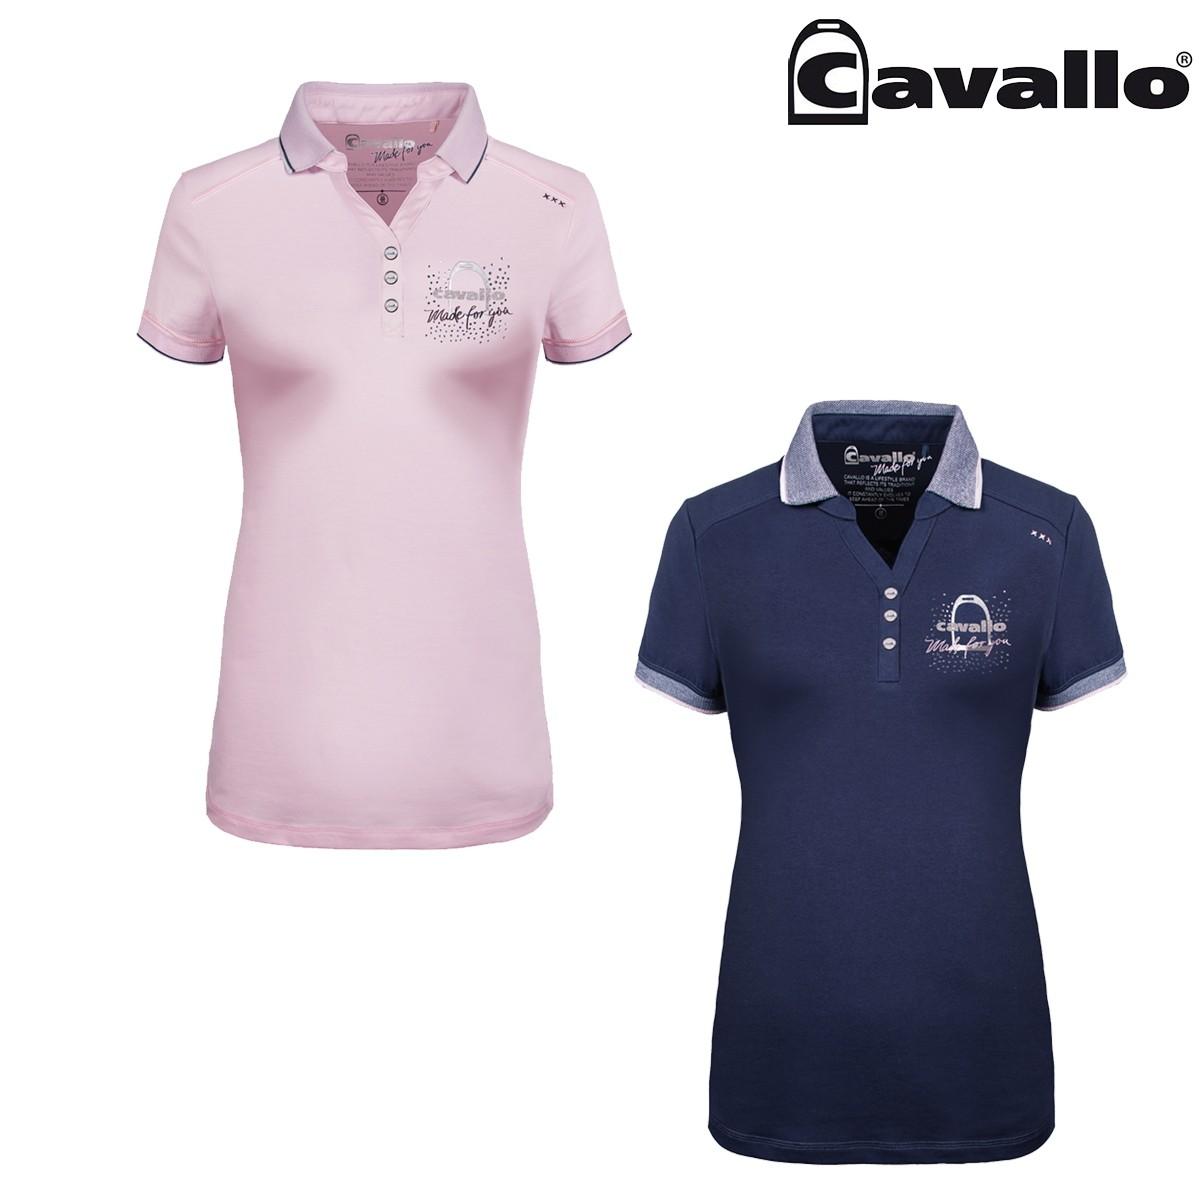 Cavallo Naomi T-Shirt